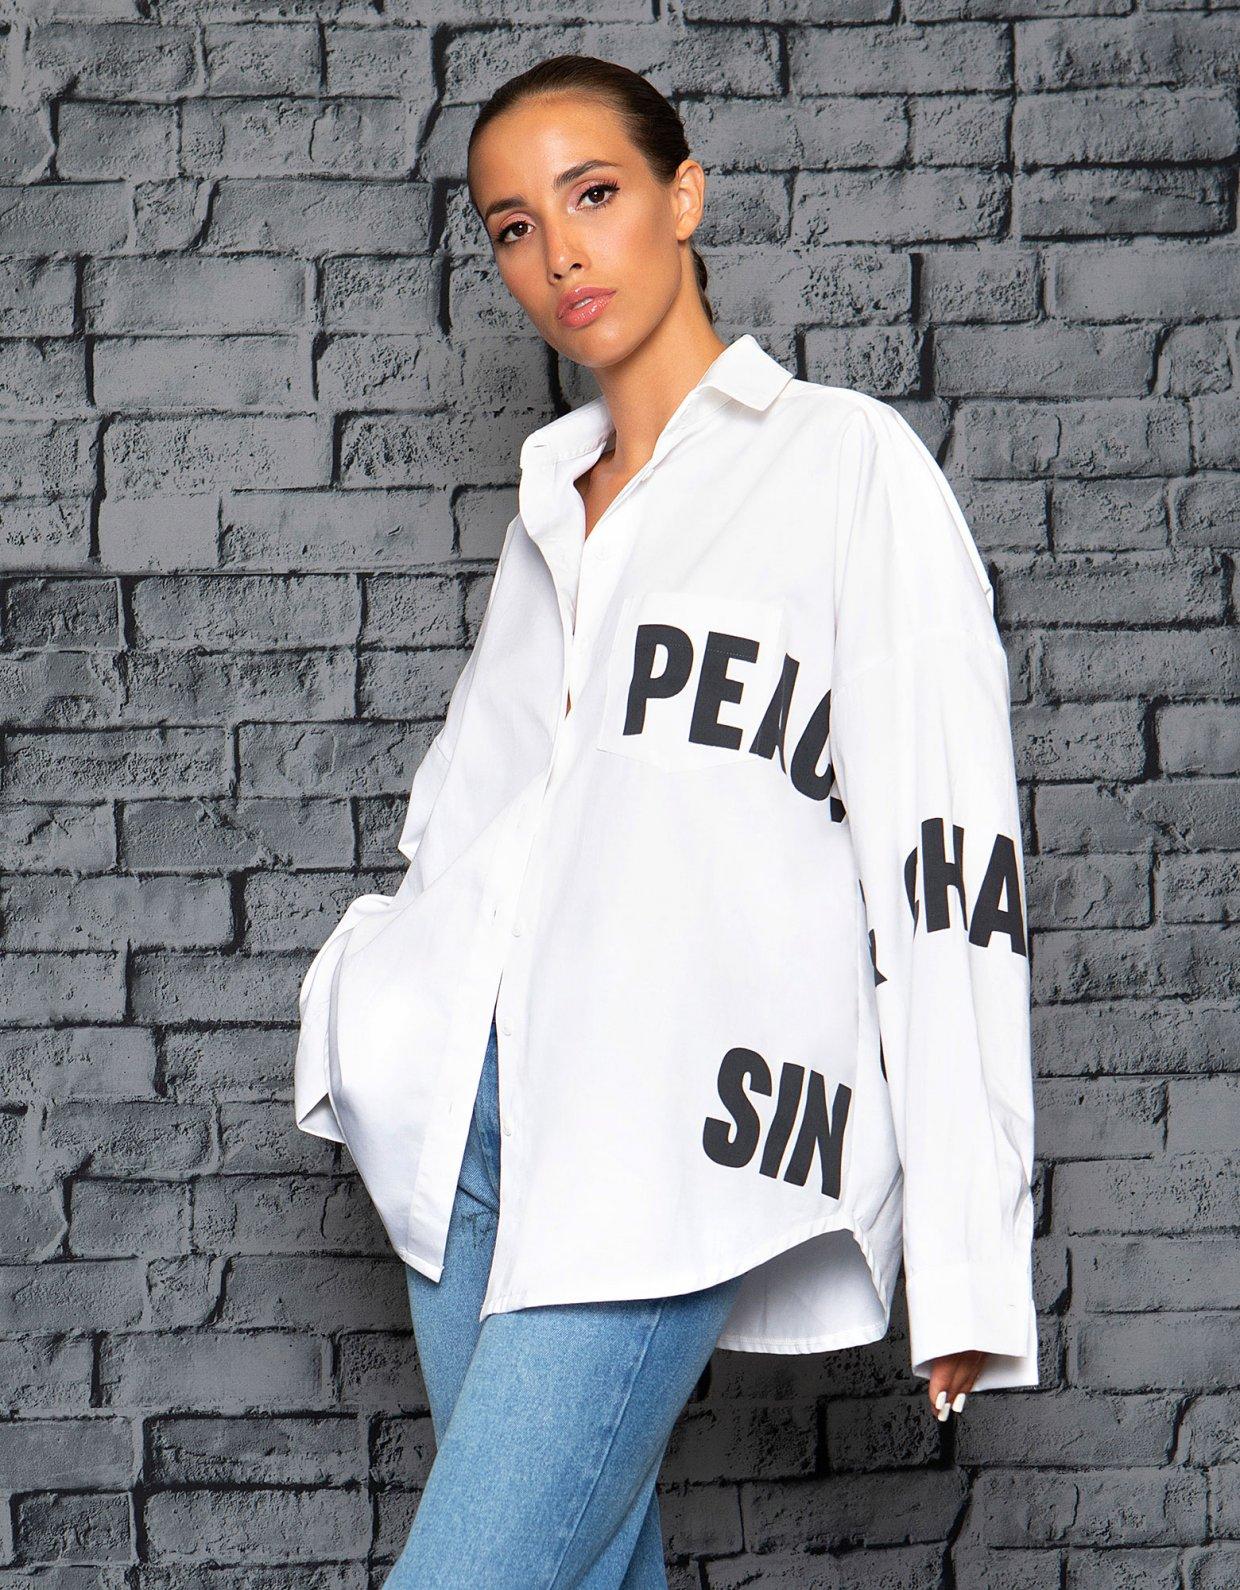 Peace & Chaos P+C white shirt